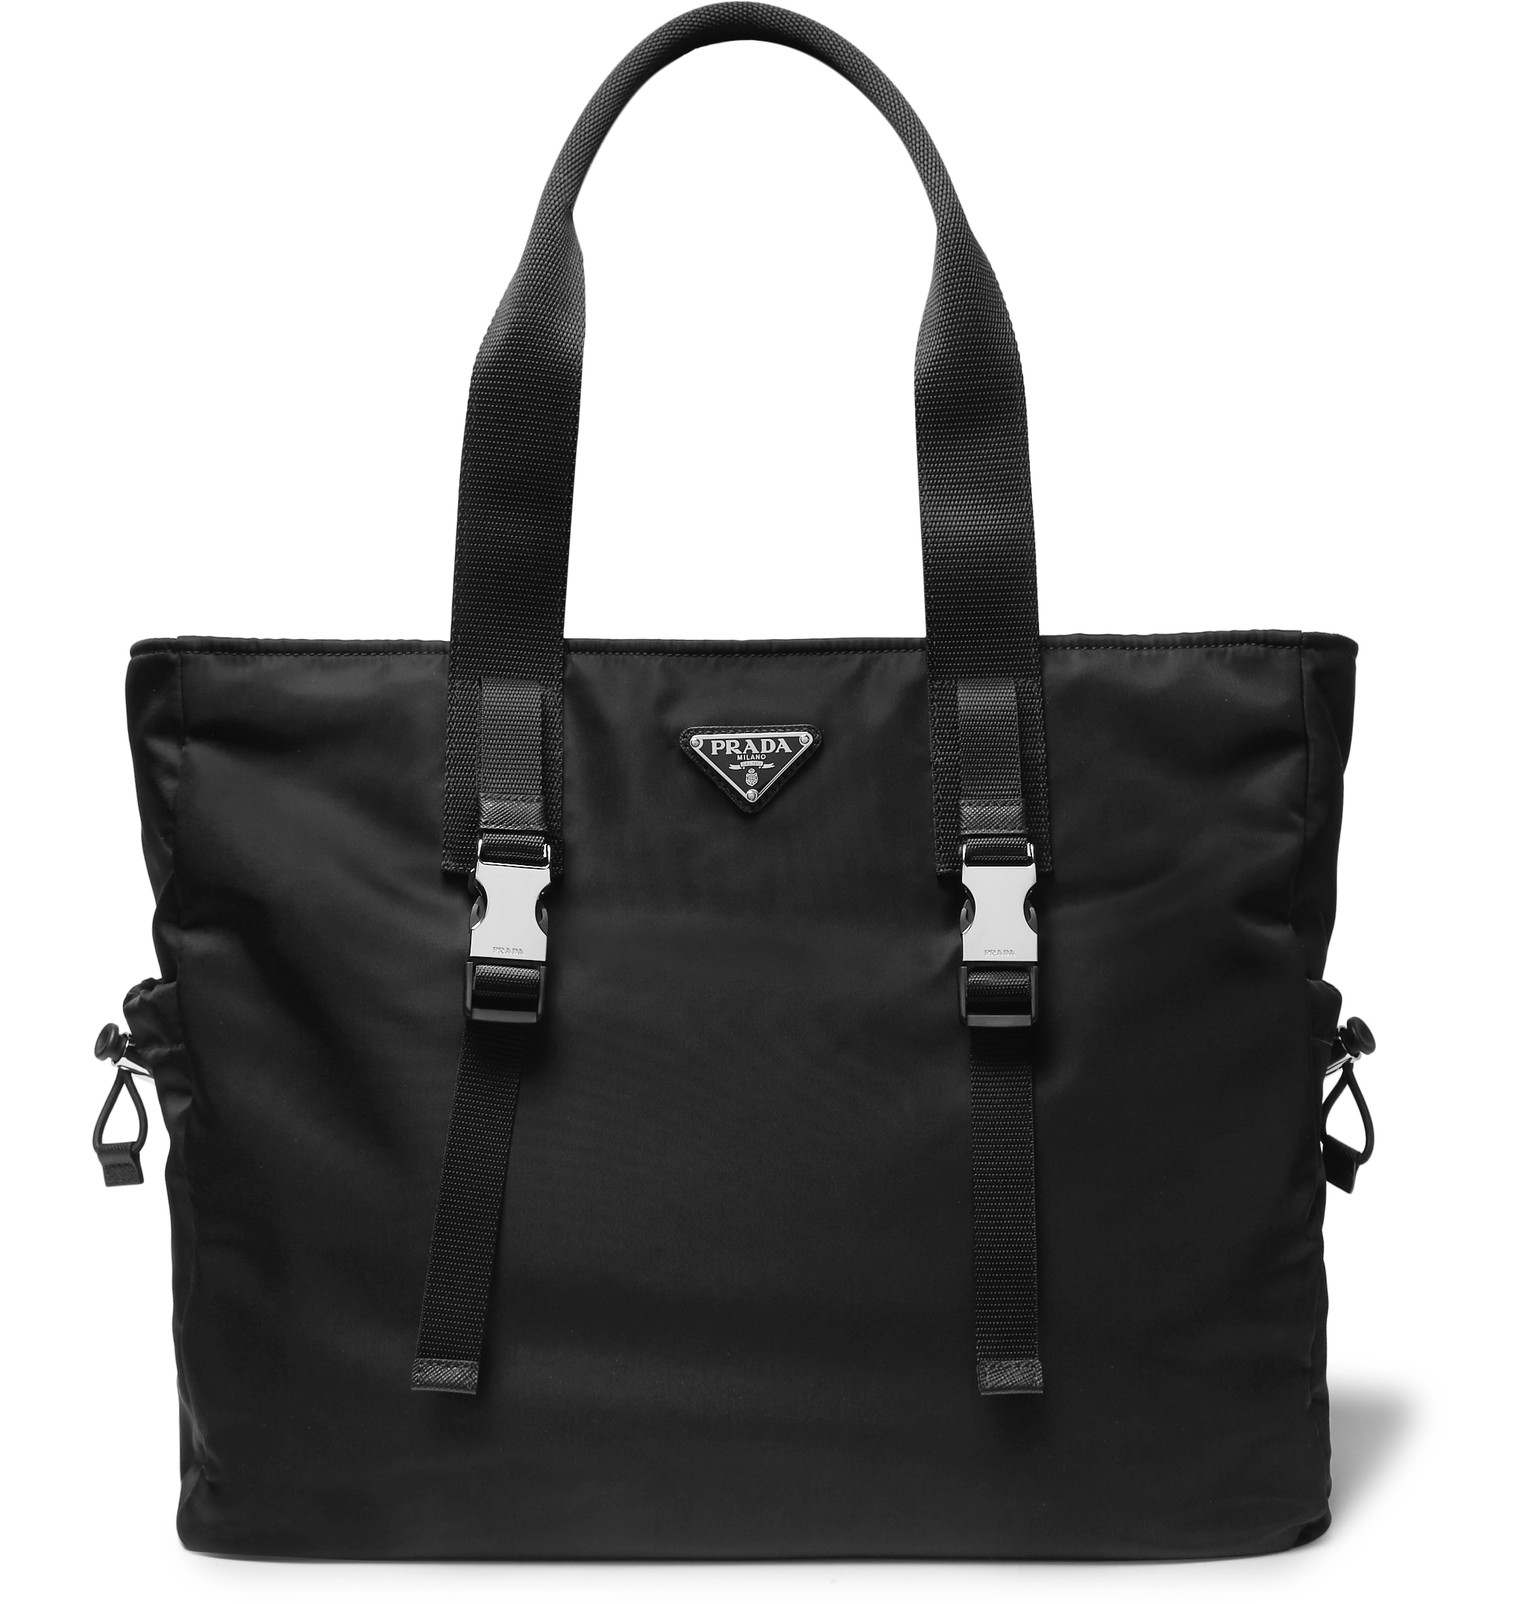 d028e93793684d Prada - Saffiano Leather-Trimmed Nylon Tote Bag